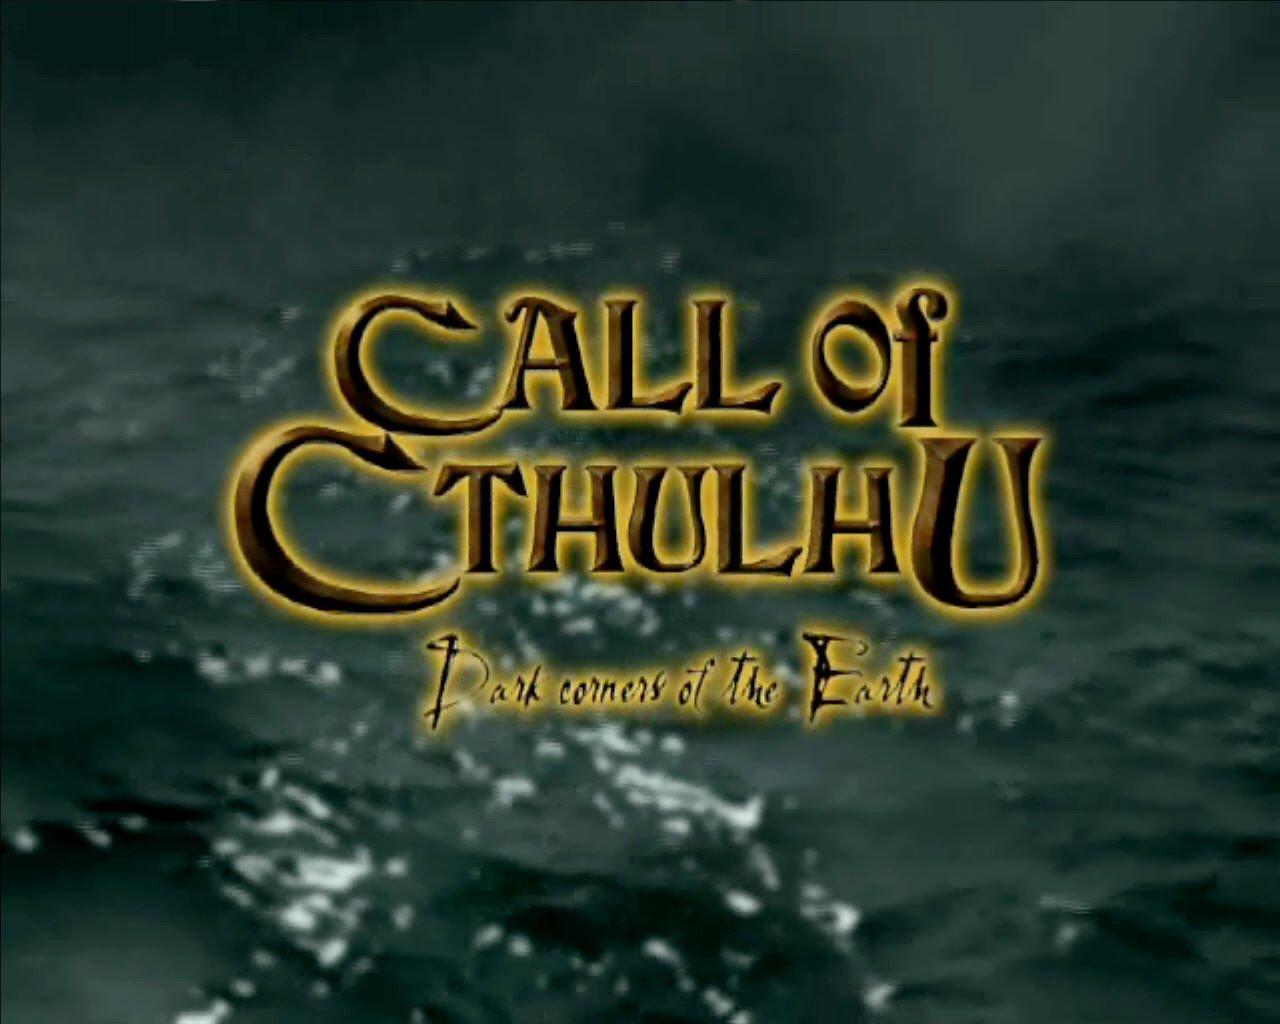 I voted for Cthulhu!. - Изображение 6